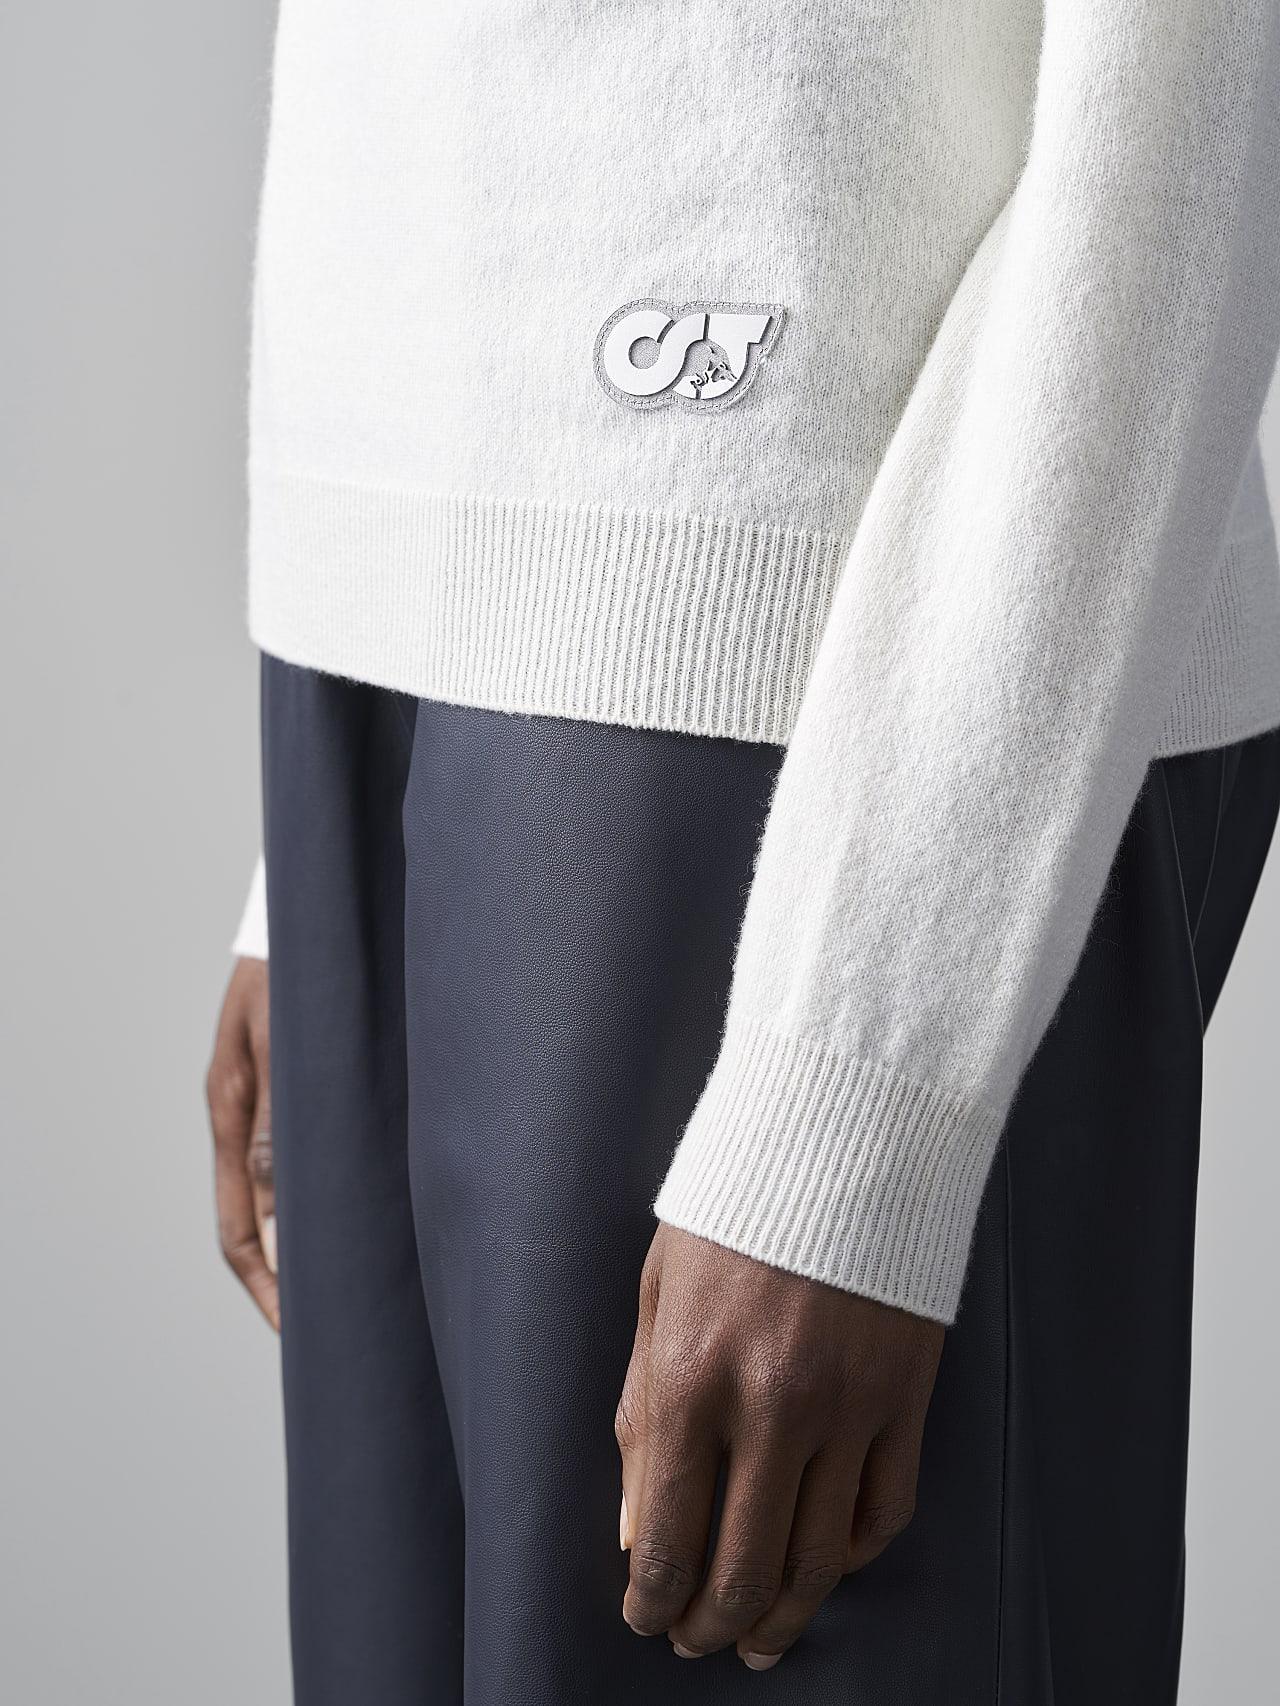 FLAMY V1.Y5.02 Seamless 3D Knit Merino-Cashmere Turtle Neck offwhite Extra Alpha Tauri